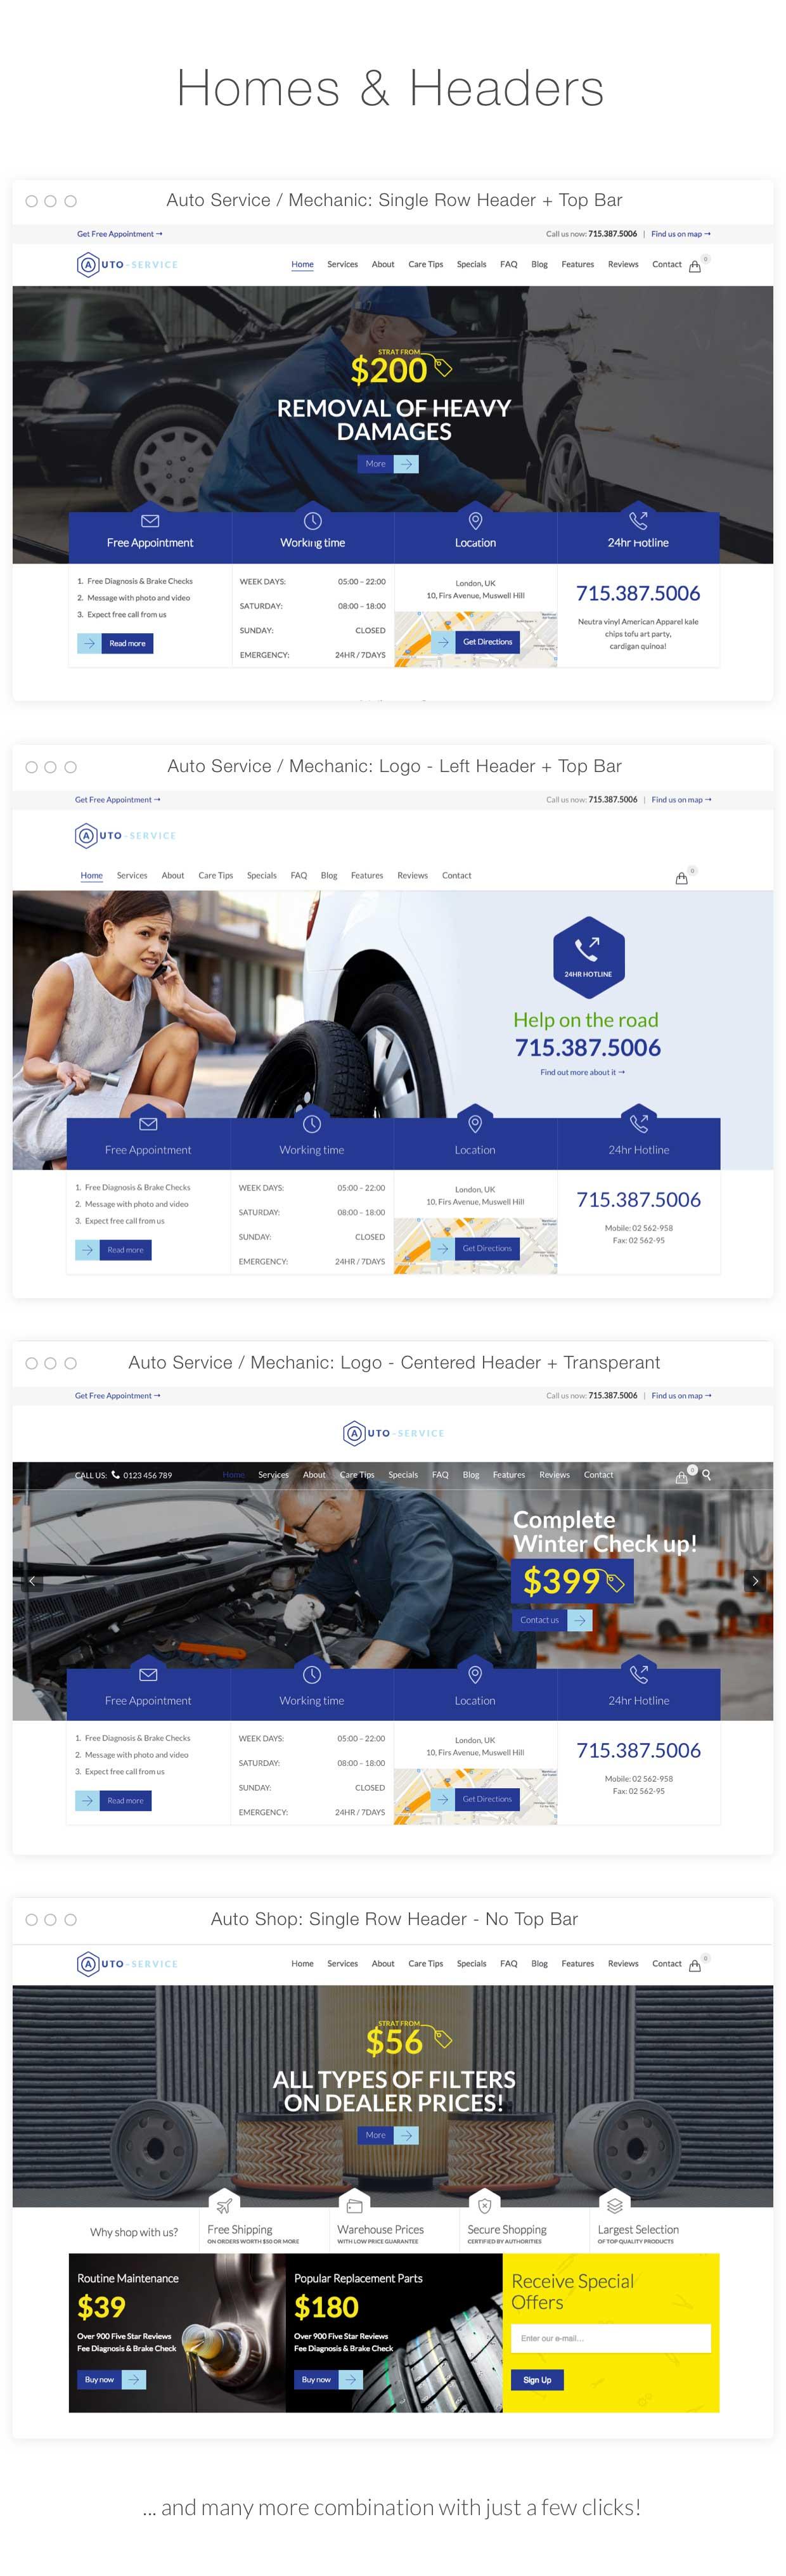 Auto Repair – Car Mechanic Services, Gobase64